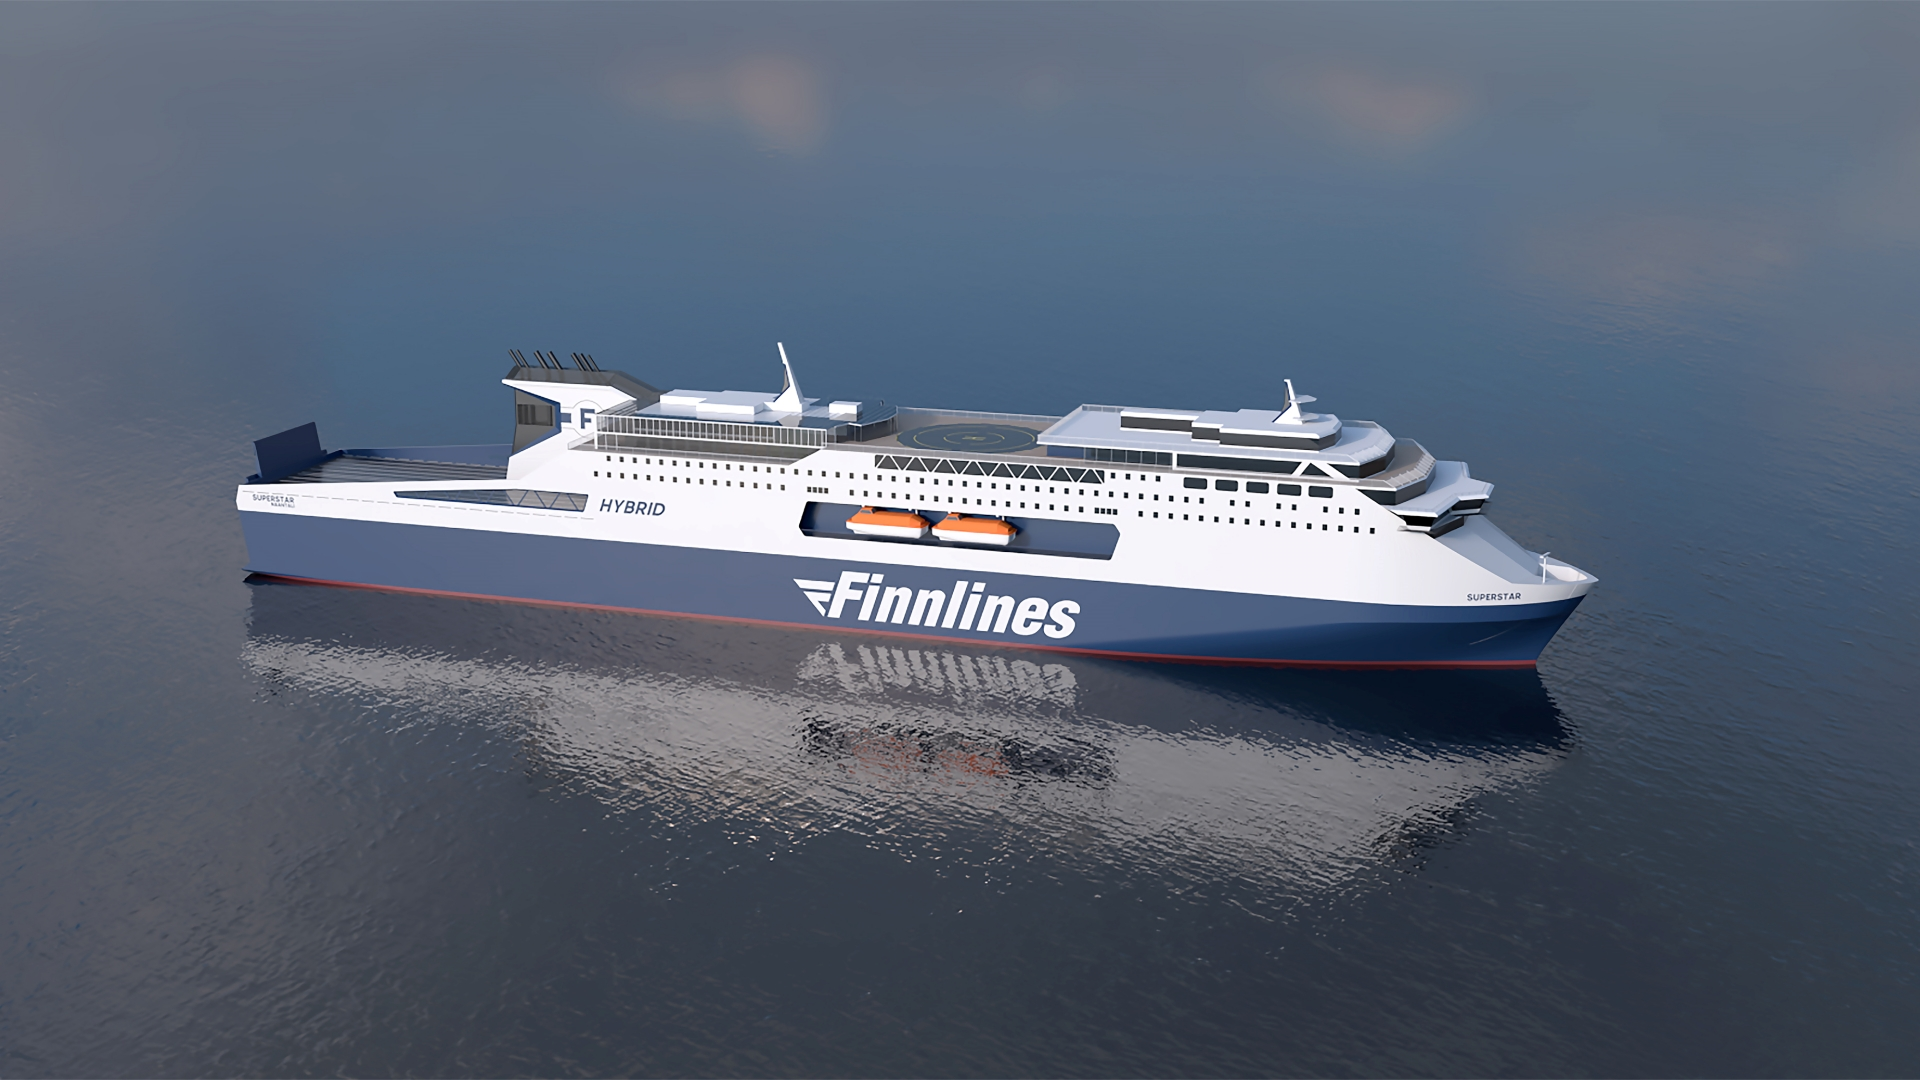 Wärtsilä bags tech order for Finnline's hybrid ferries duo